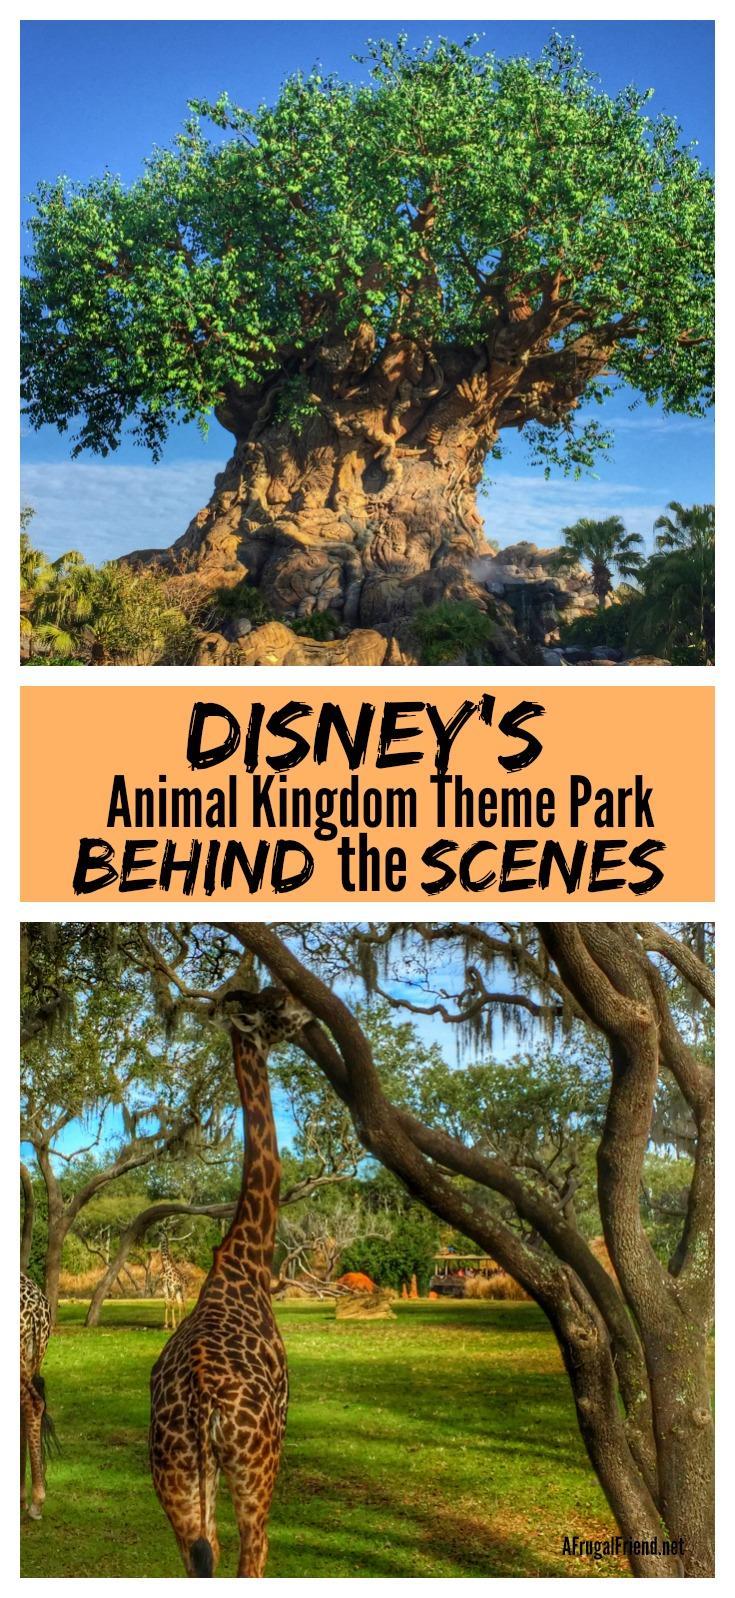 Disney's Animal Kingdom Theme Park Behind the Scenes